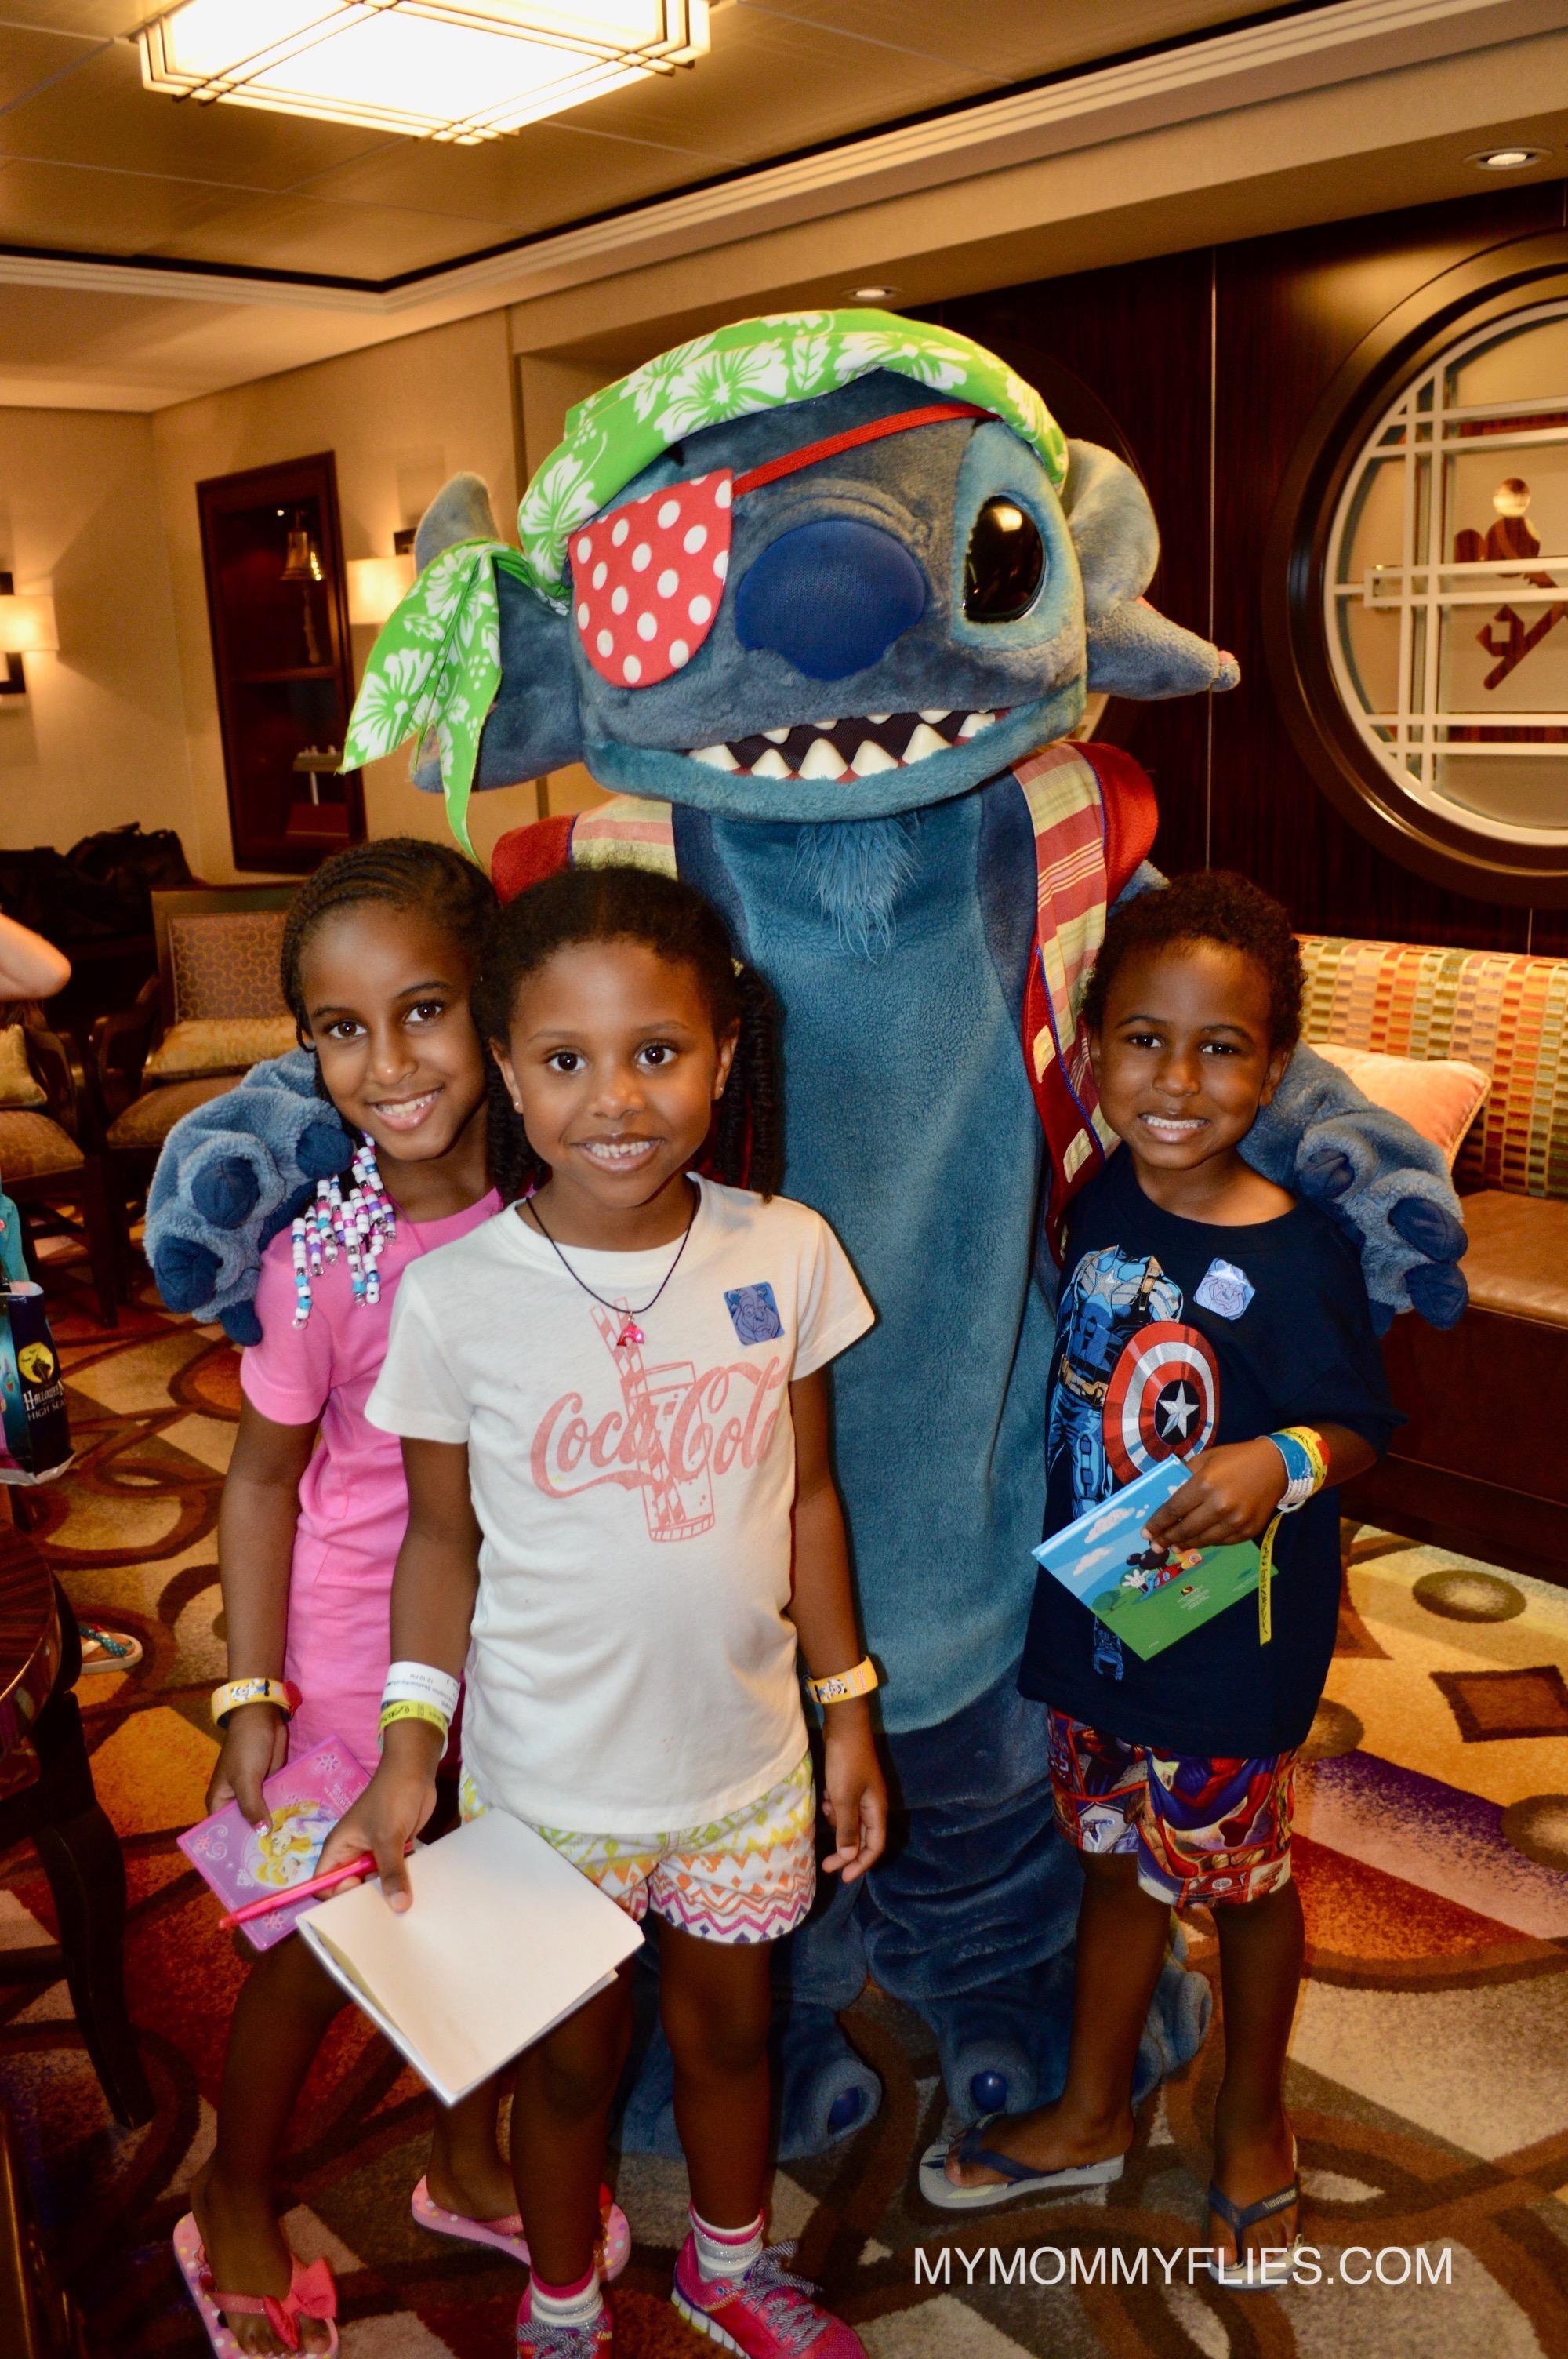 Disney_Stitch_Meet_and_Greet_Disney_Cruise_Line_Concierge